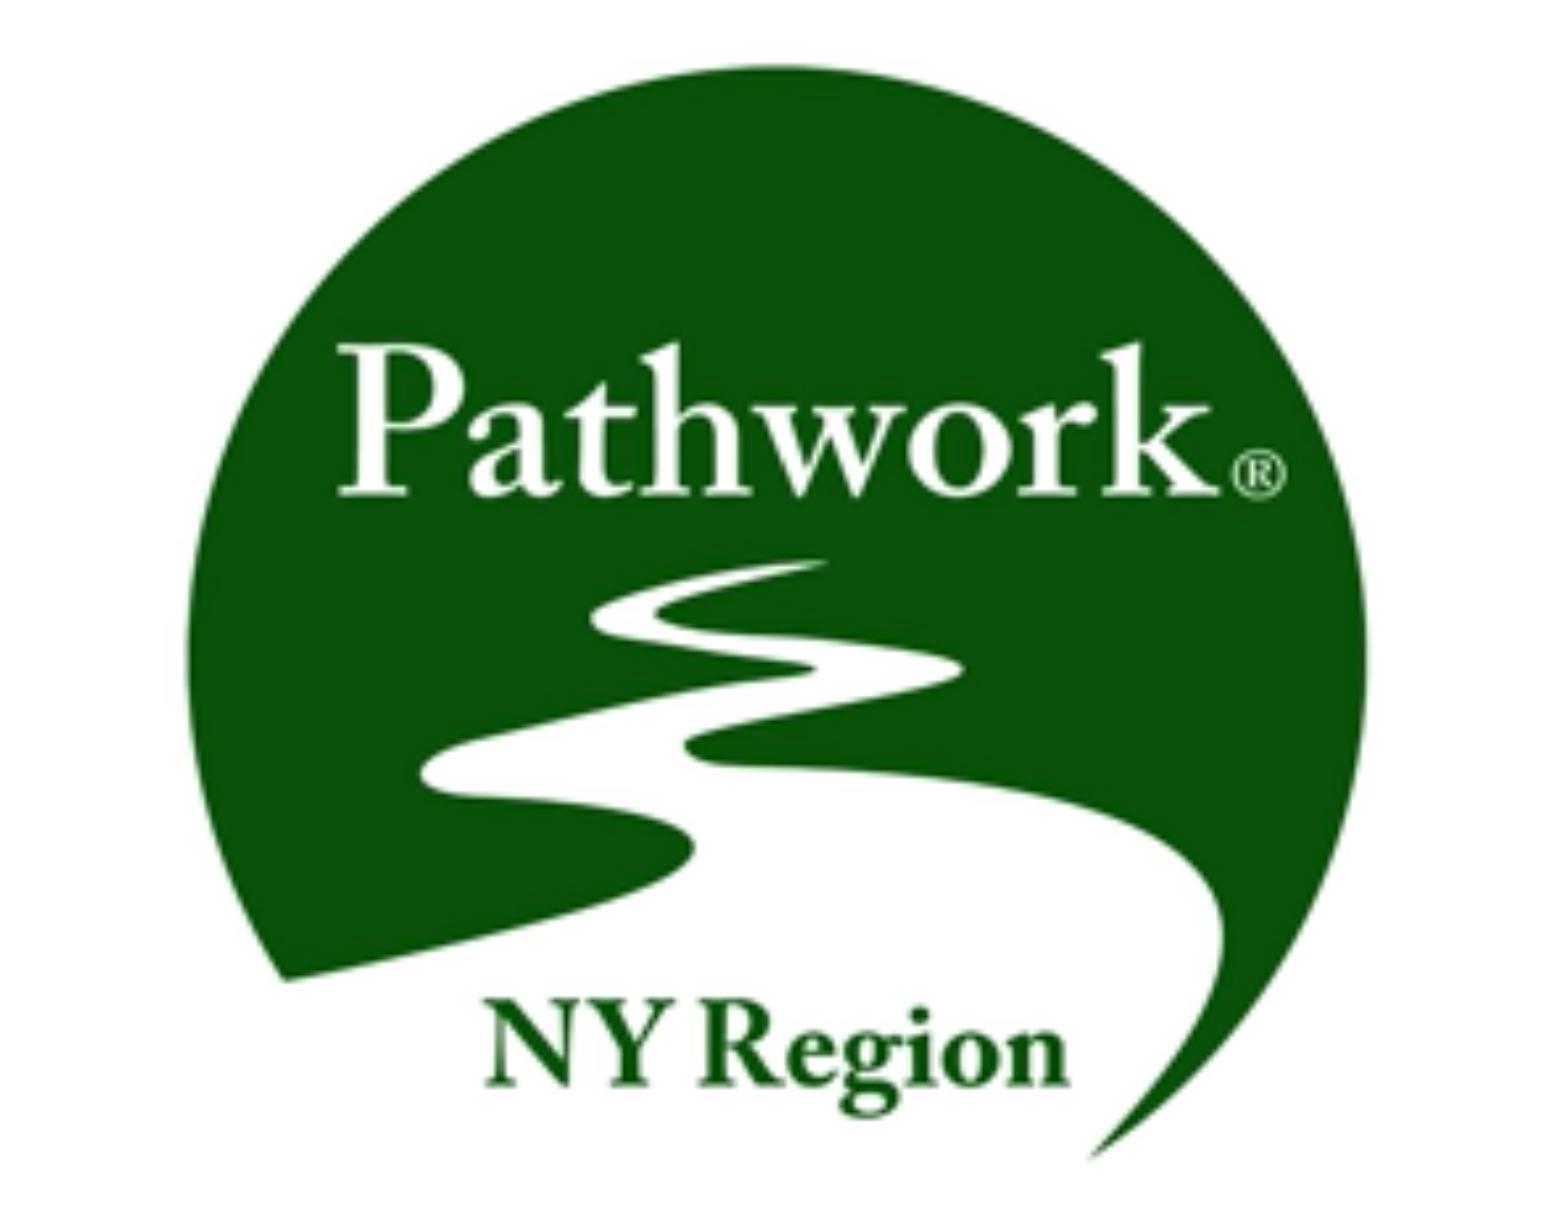 NYPathwork.org